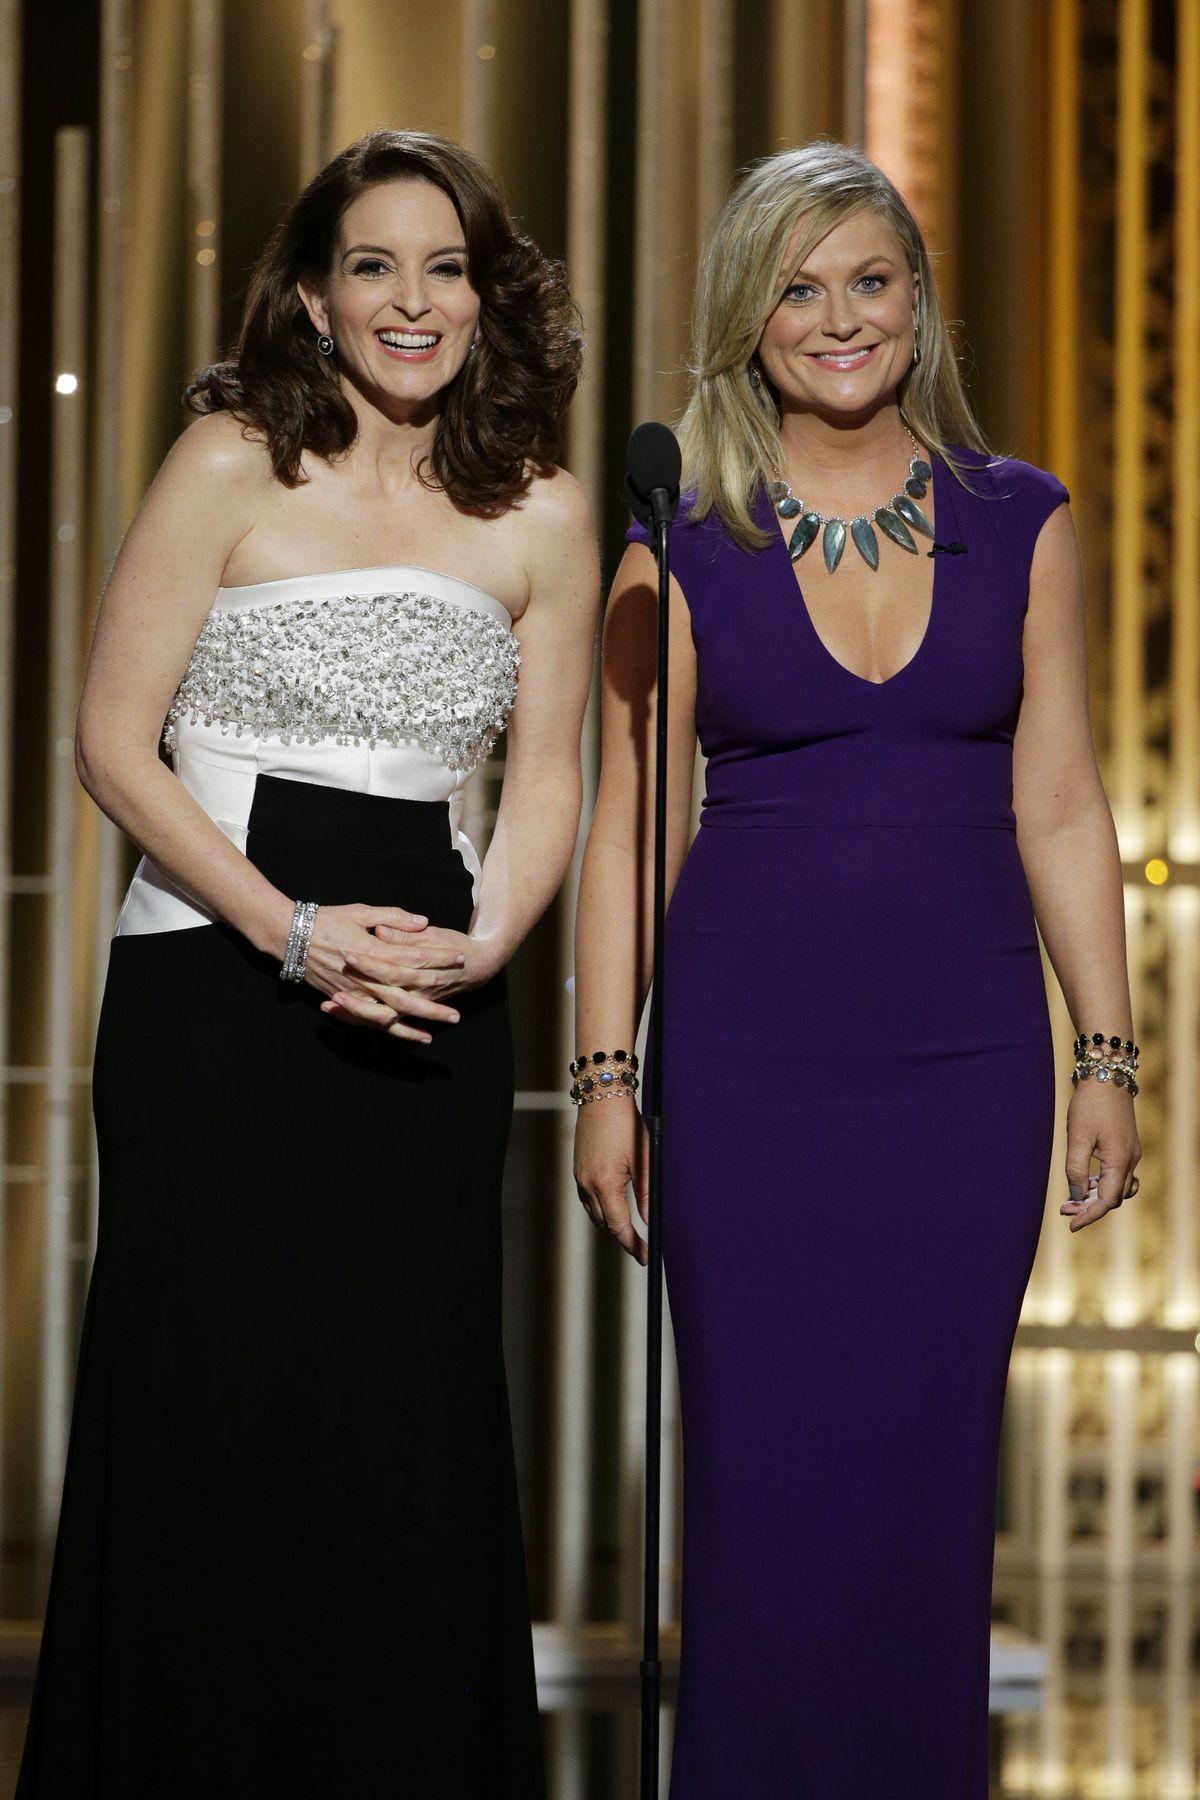 Tina Fey and Amy Poehler Hosting 2015 Golden Globes